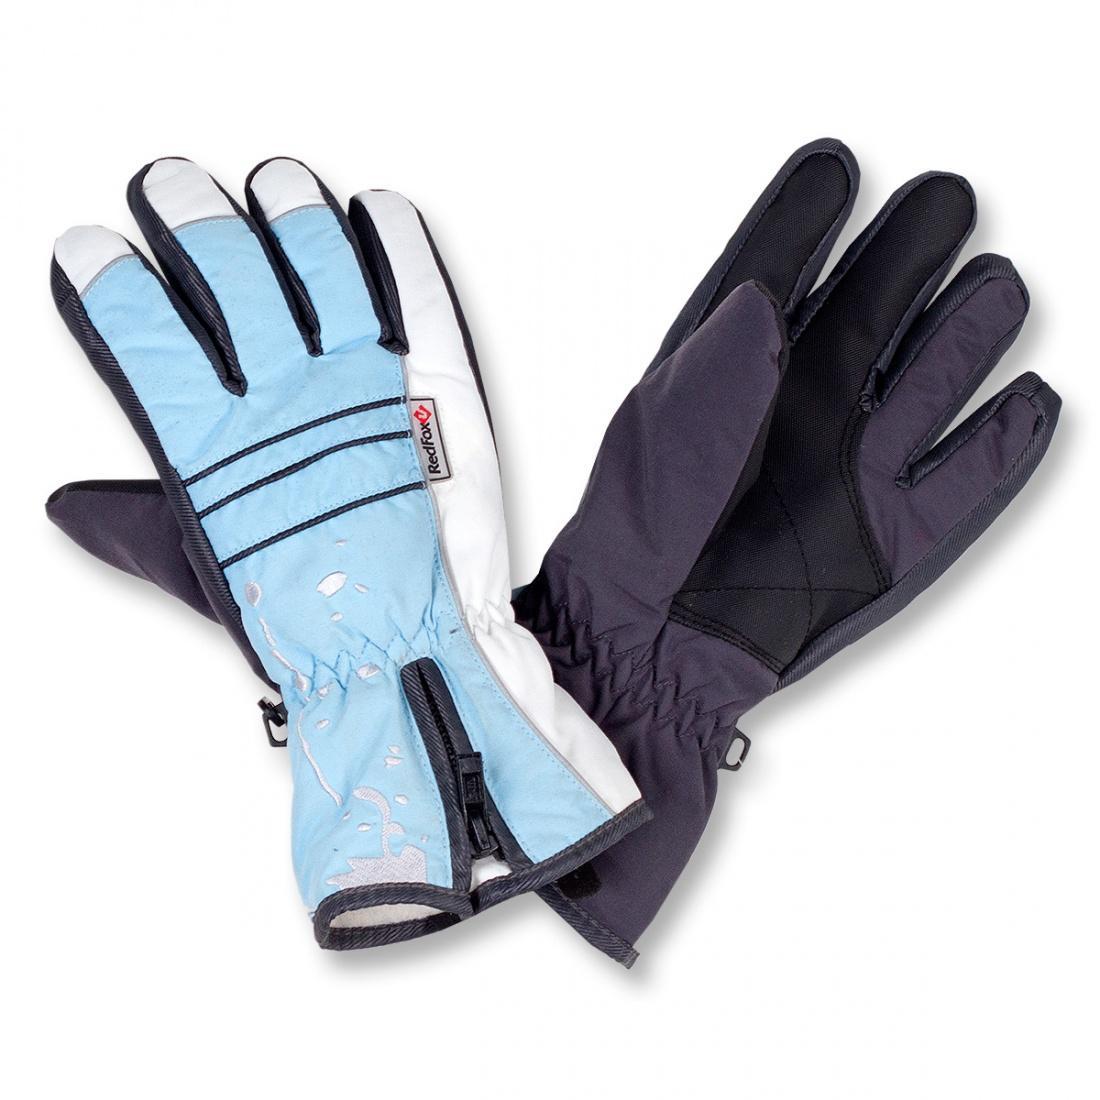 Перчатки SprayПерчатки<br><br> Удобные и теплые перчатки для детей от 6 до 12 лет.<br><br> <br><br><br><br> Материал – Nylon, DWR.<br><br> <br><br><br> Подкладка – Vario Dry.<br><br><br><br>...<br><br>Цвет: Небесно-голубой<br>Размер: XXL